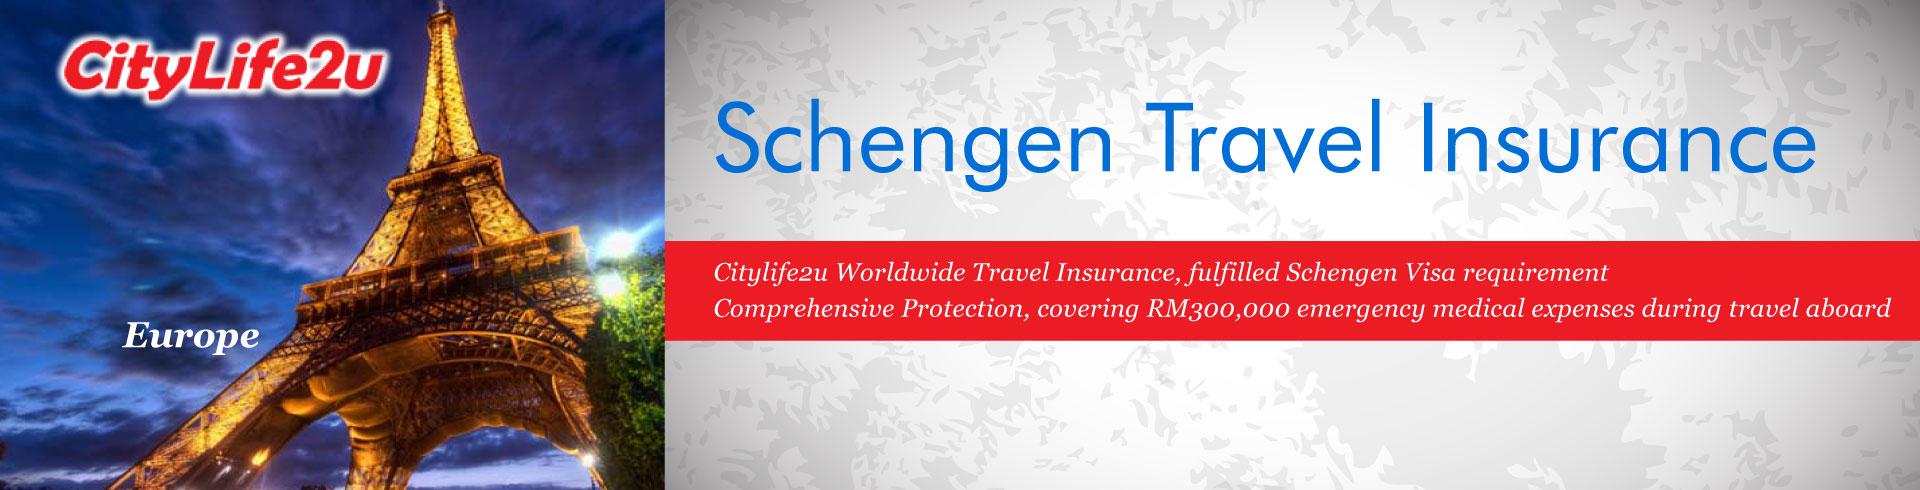 Fulfilled Schengen Visa requirement.